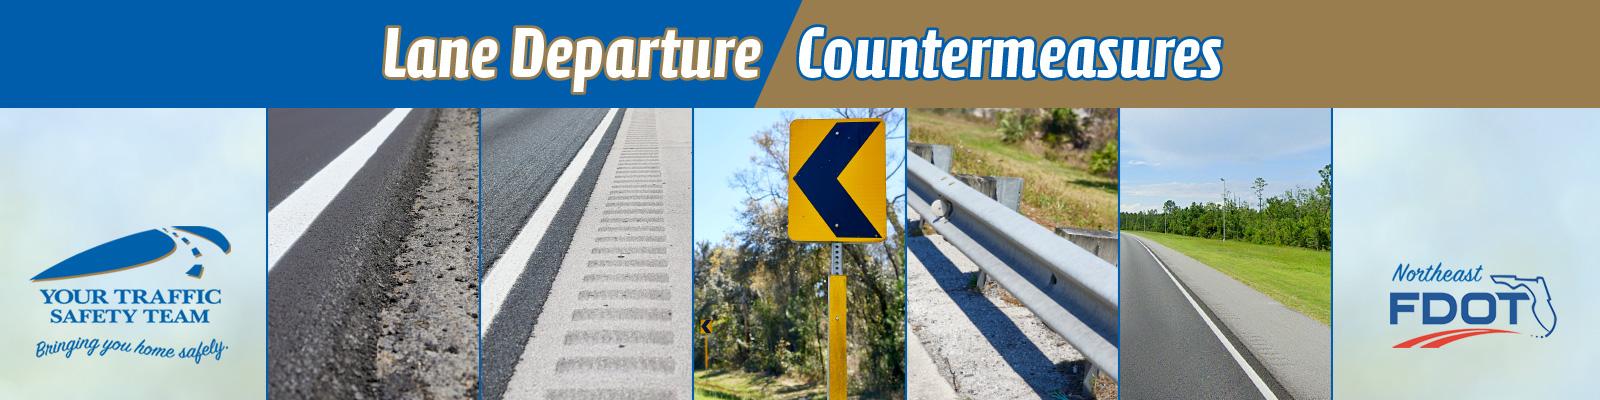 Lane Departure Countermeasures